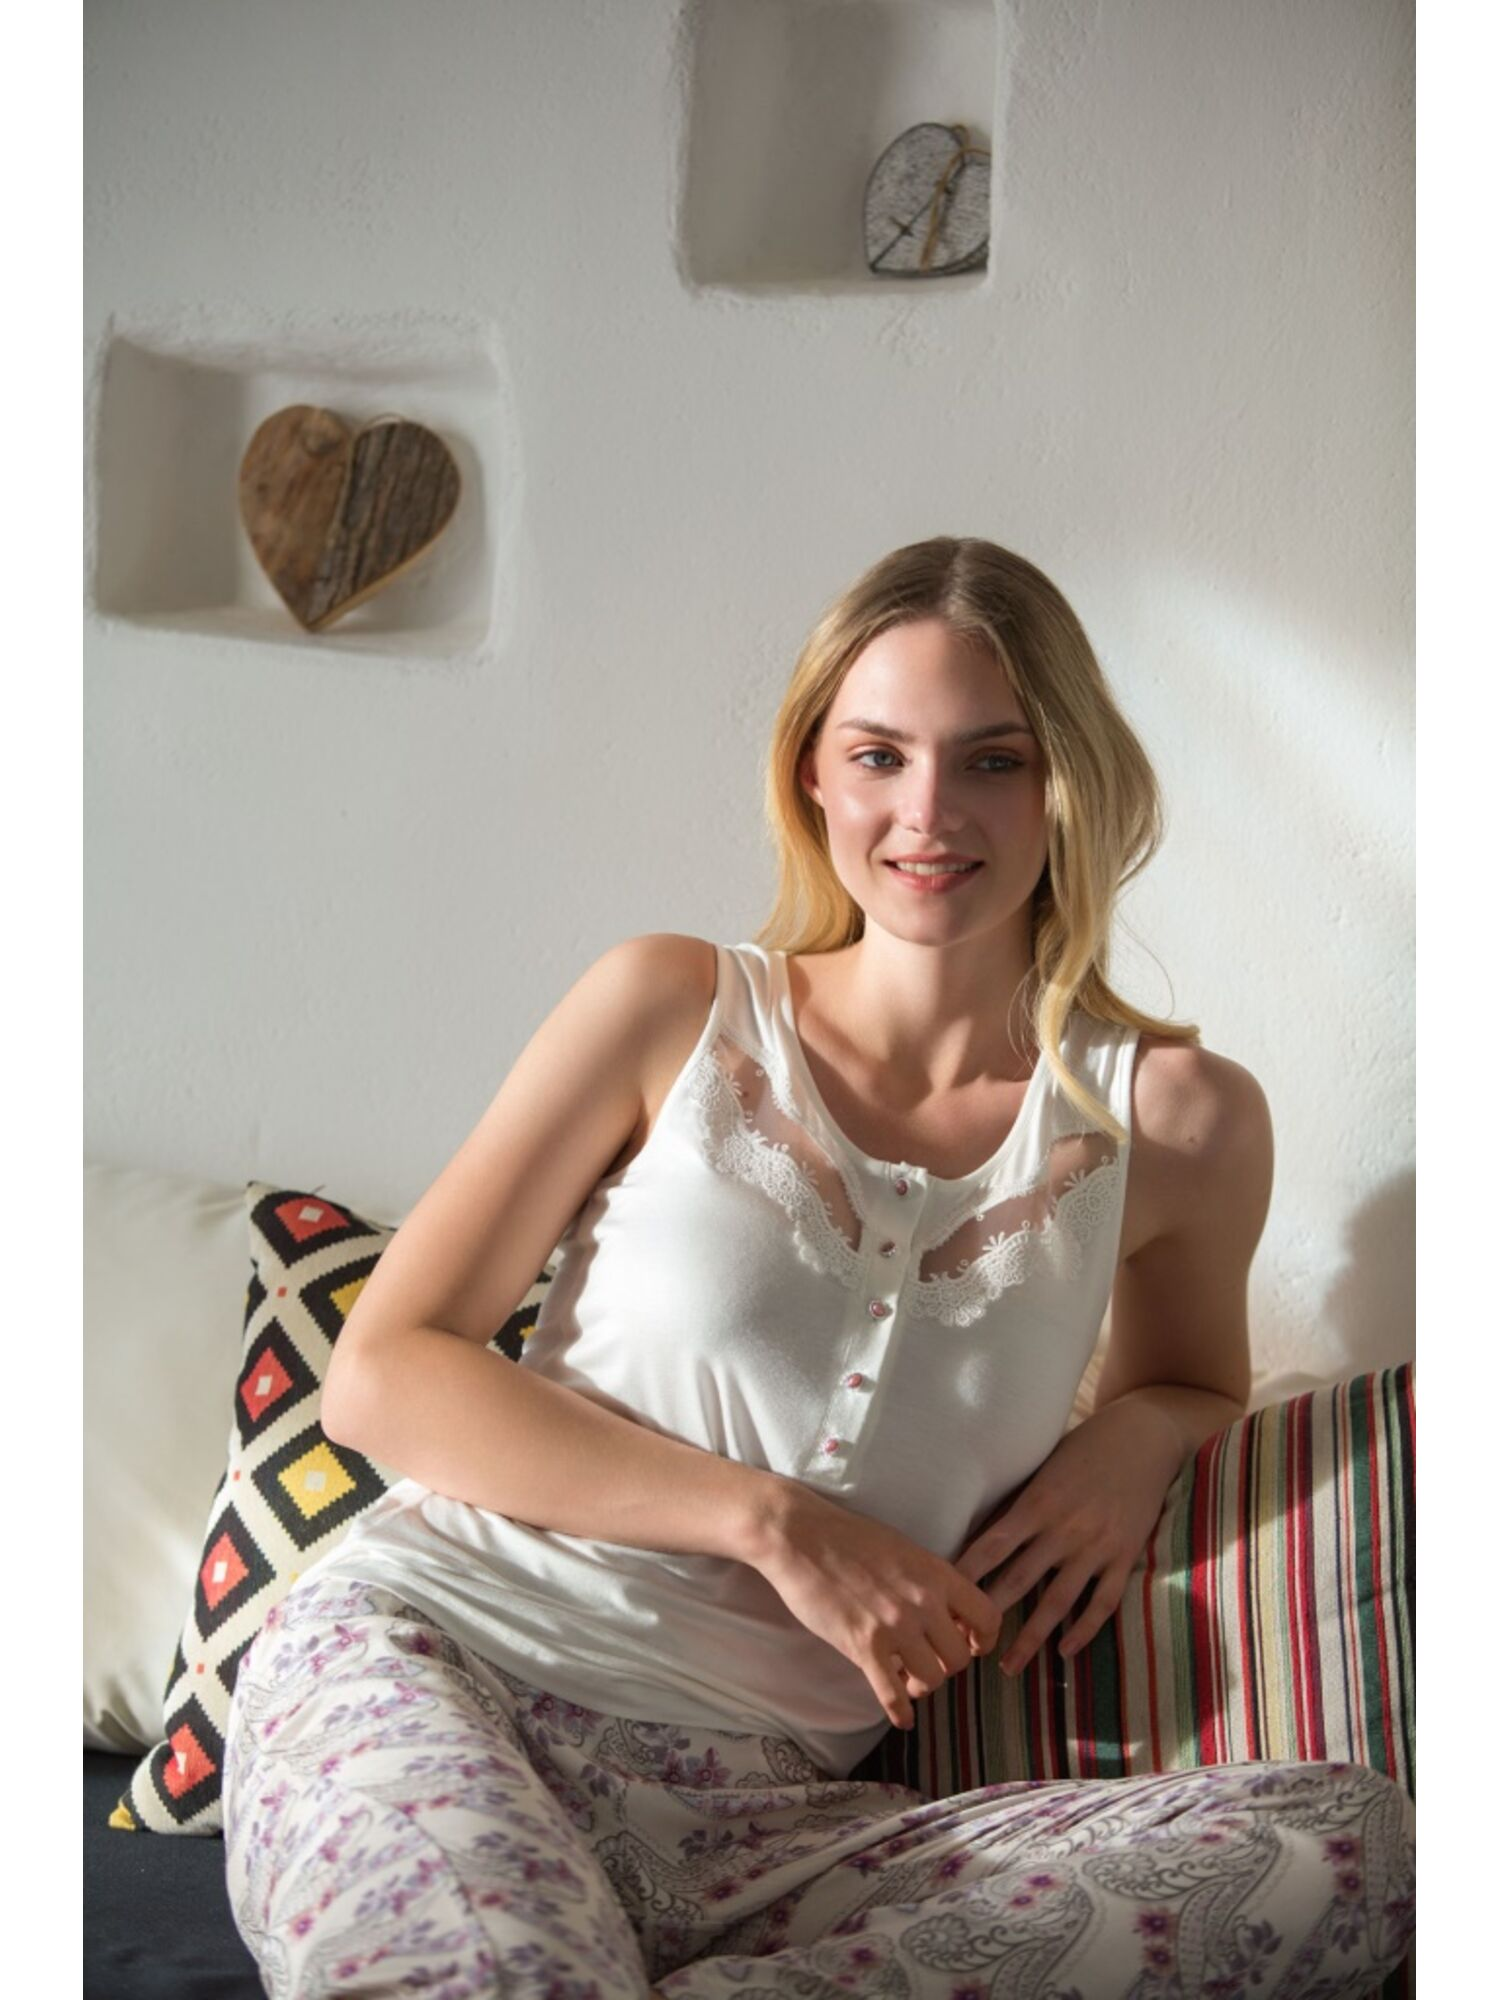 Комплект-тройка 1316, Miss Loren (Турция)